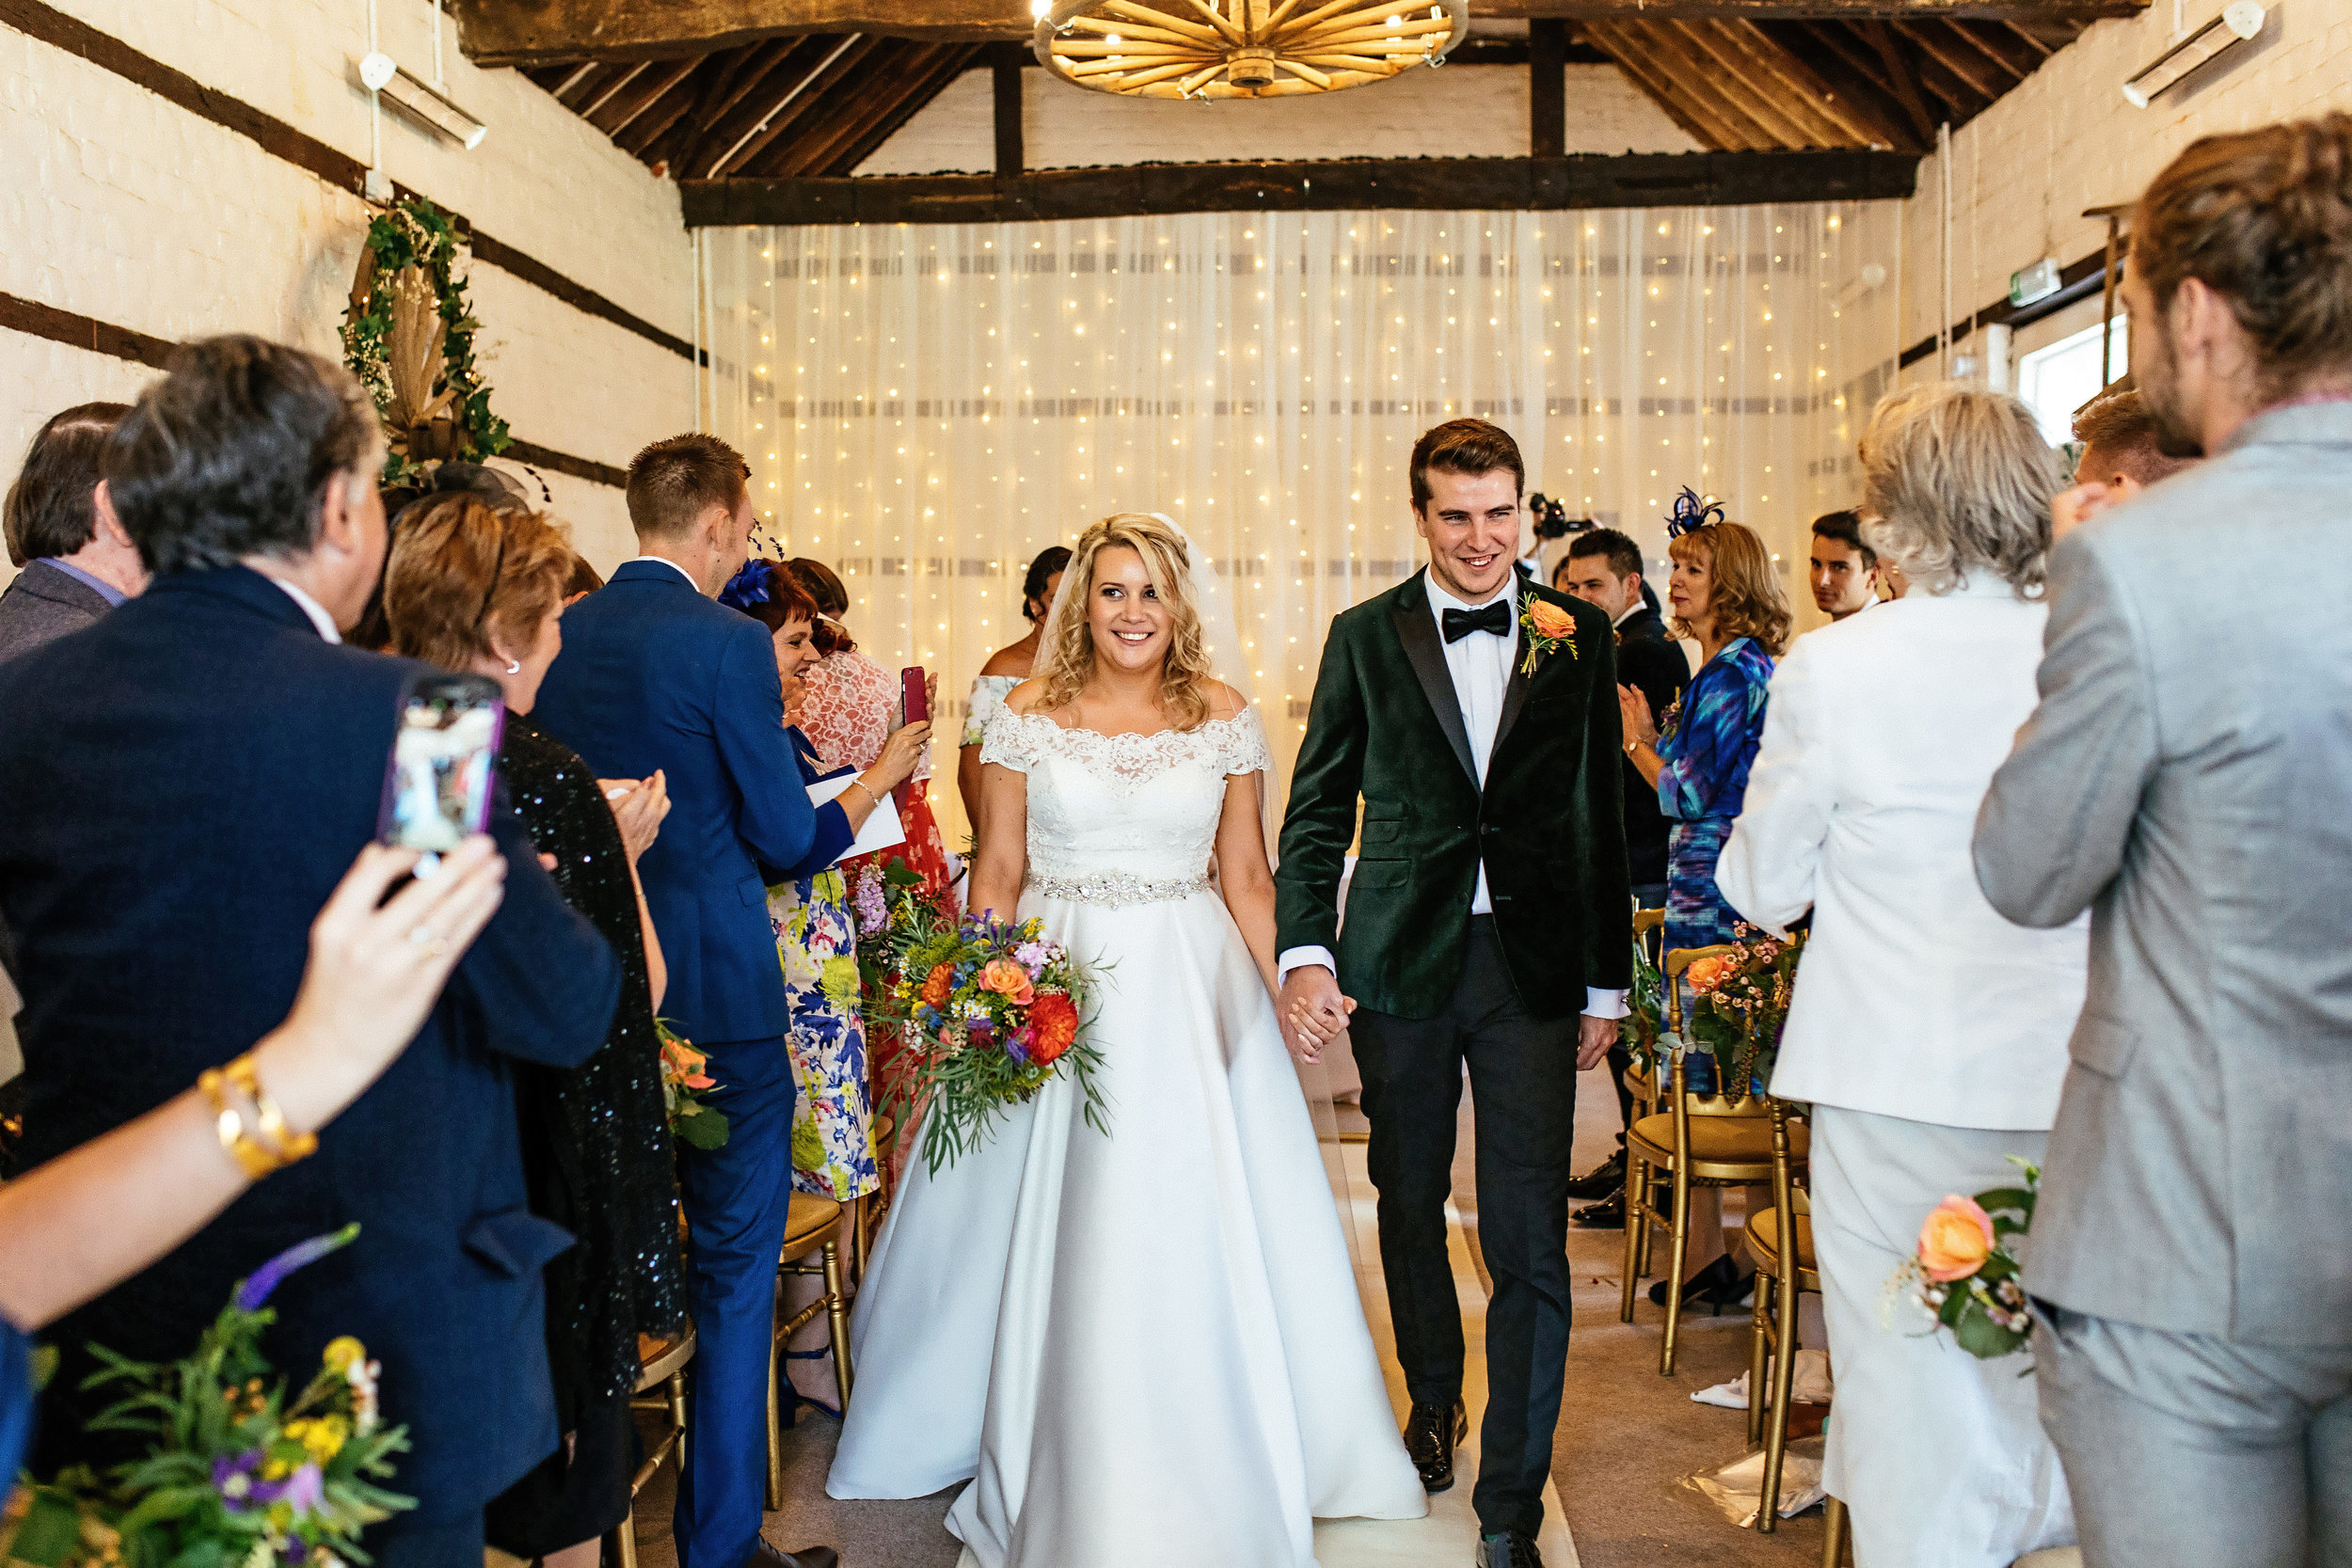 Tamara-and-Richard-Wedding-Highlights-29.jpg